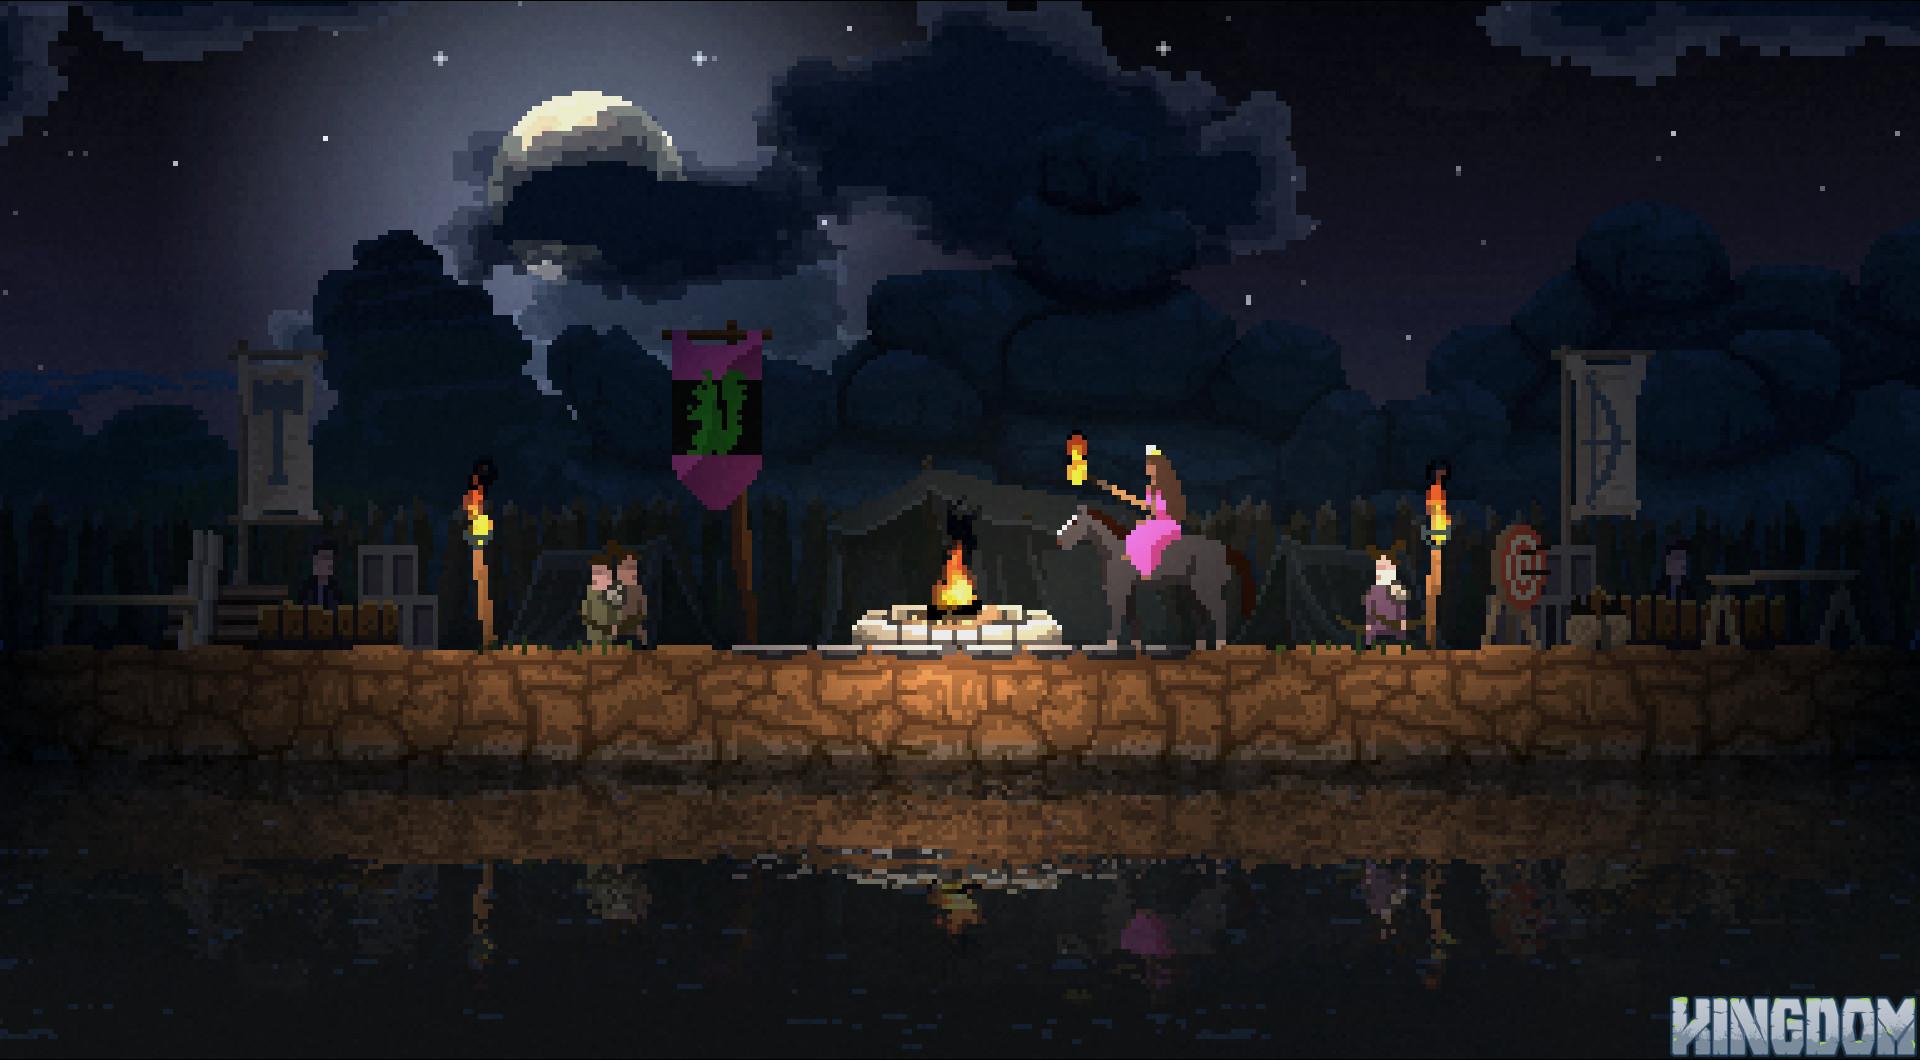 Kingdom Review Raw Fury Pixel Art Horseback 2D Strategy ...